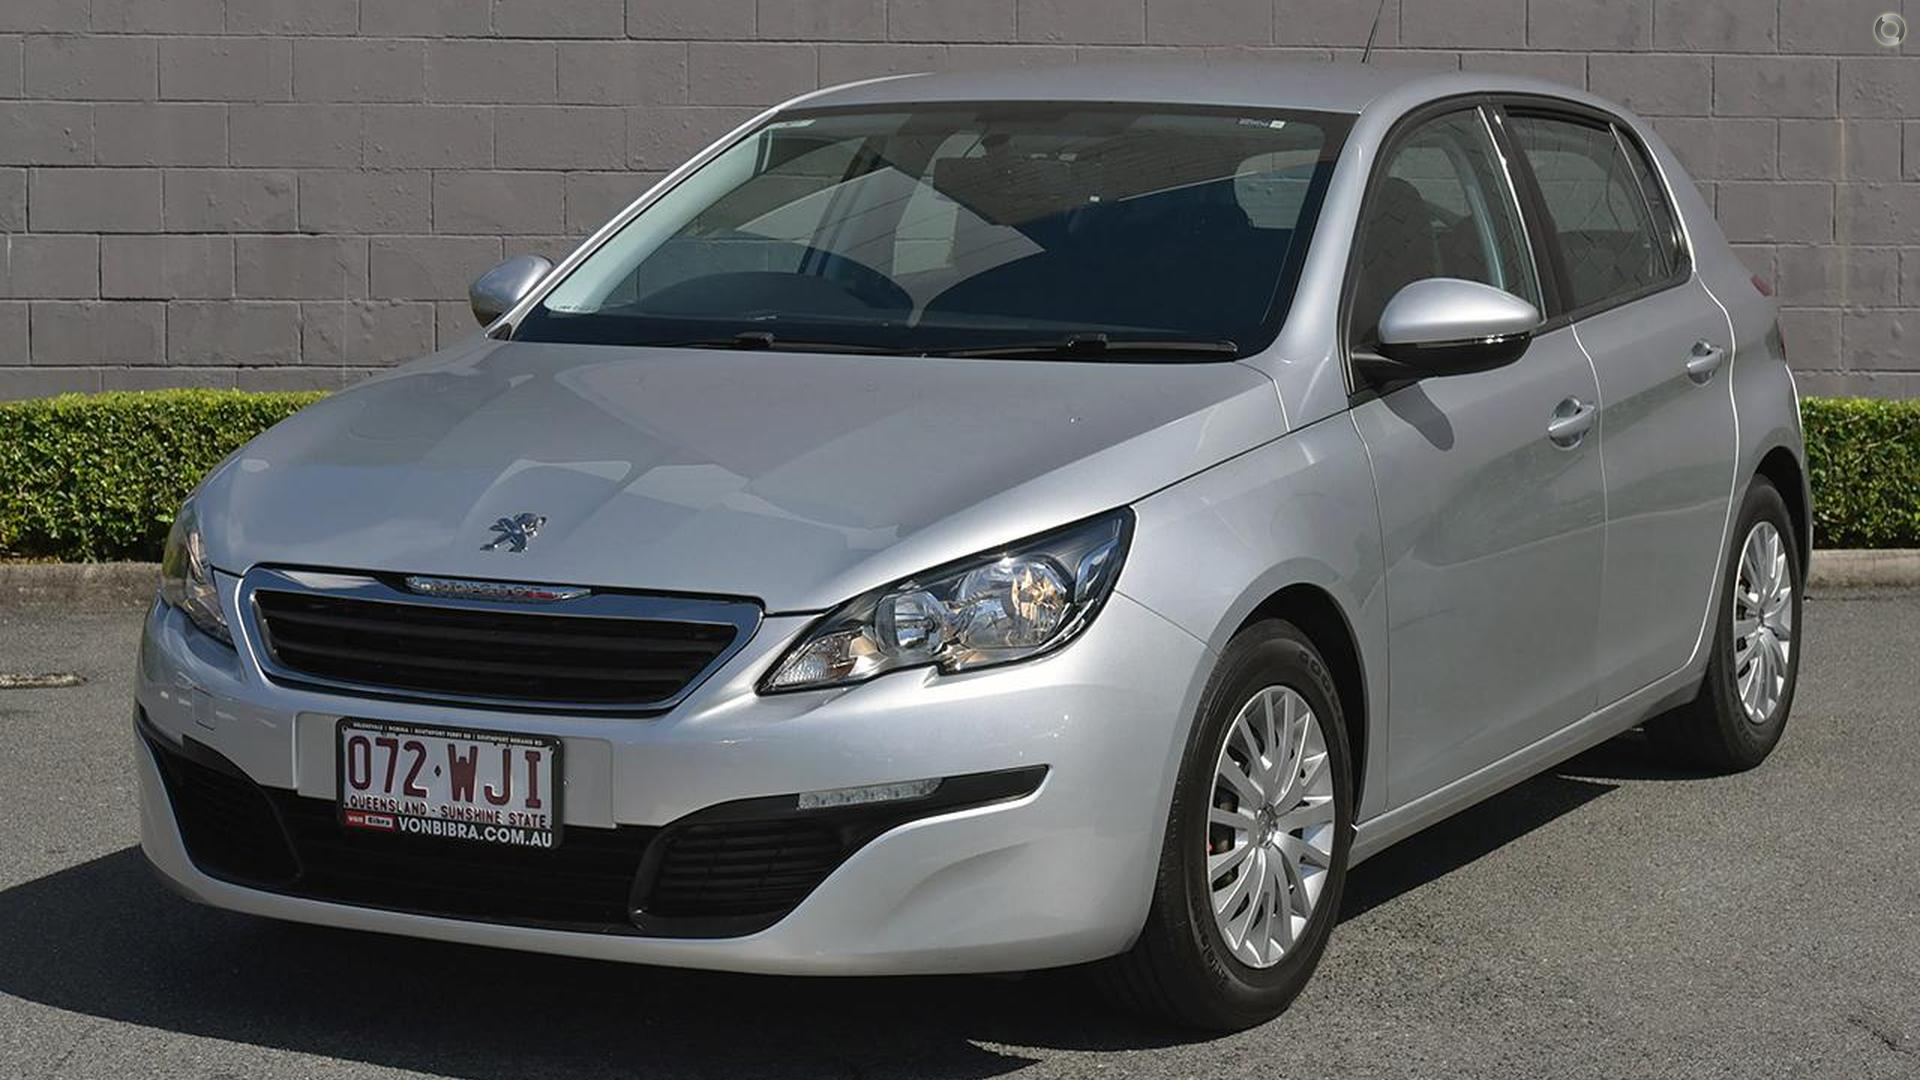 2014 Peugeot 308 T9